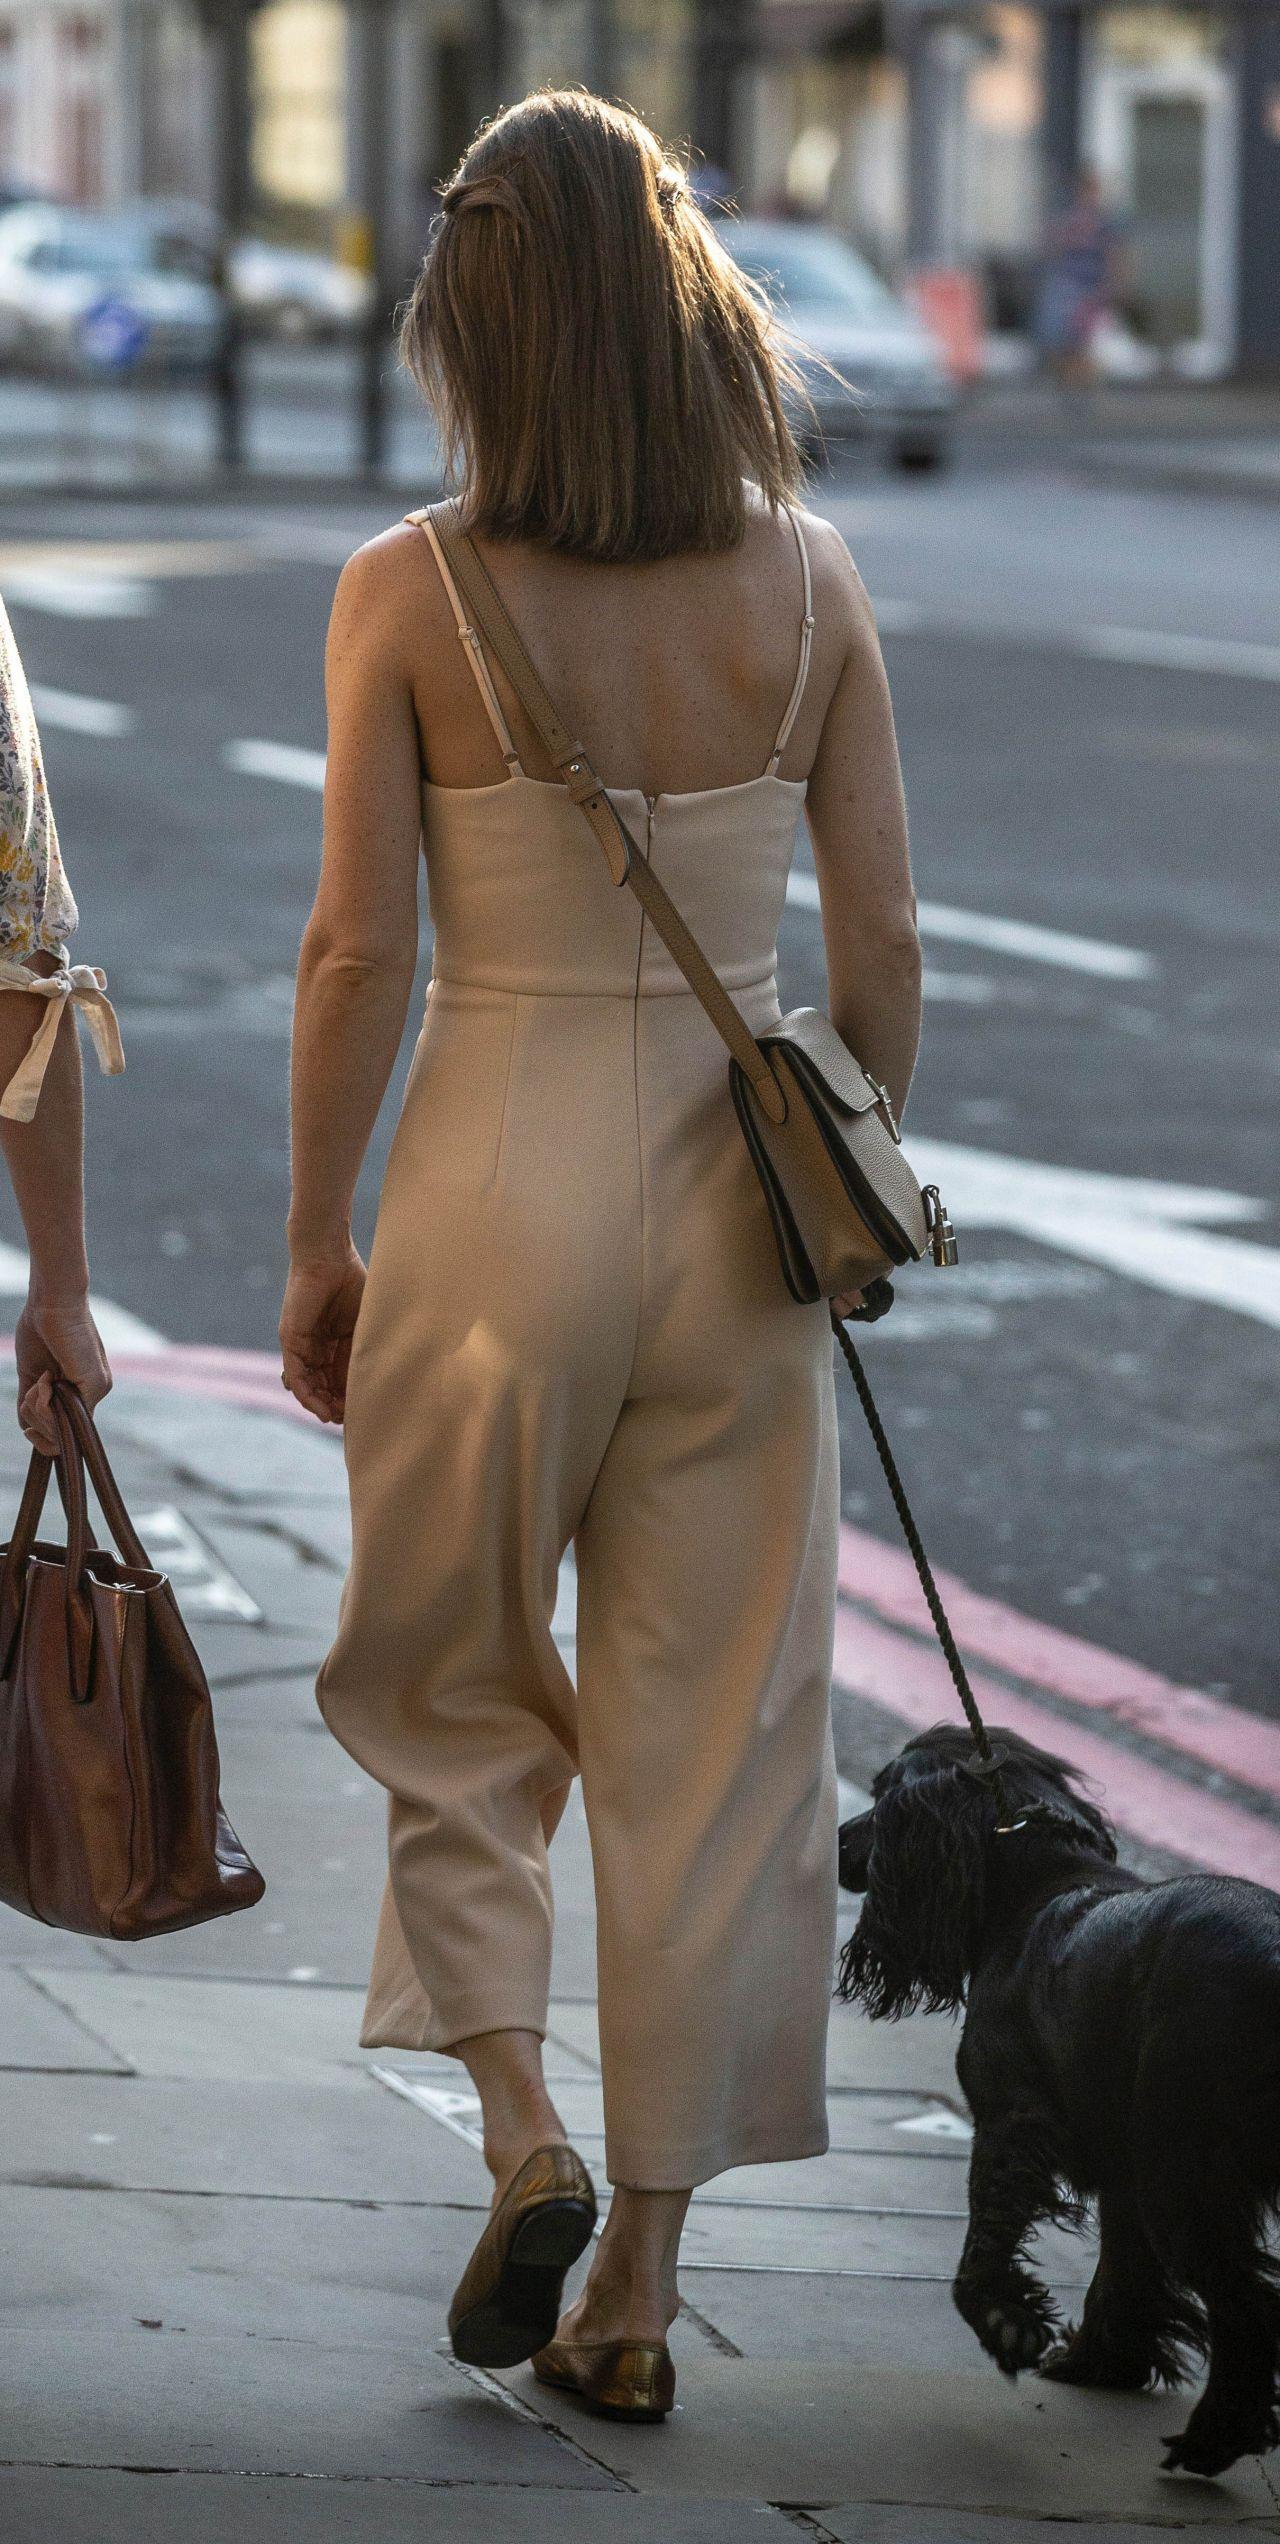 Selfie Pippa Middleton  nudes (61 pics), Instagram, lingerie